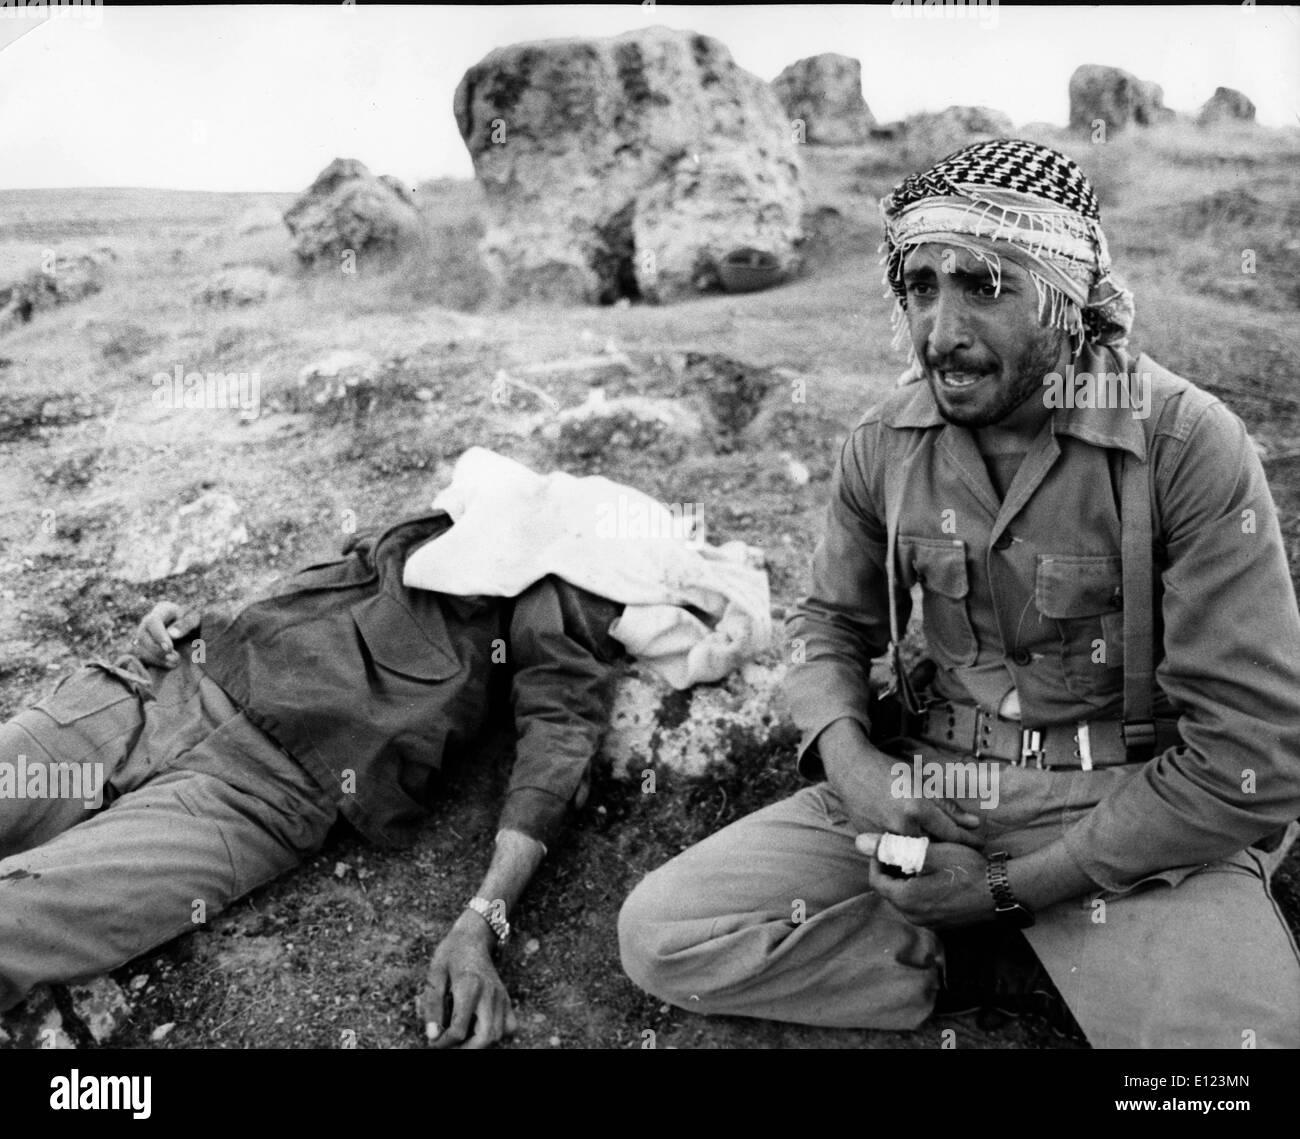 Mar 25, 1985; Tehran, Iran; Iran's perspective of the 1980 war between Iran and Iraq. (Credit Image: © KEYSTONE Pictures USA) - Stock Image